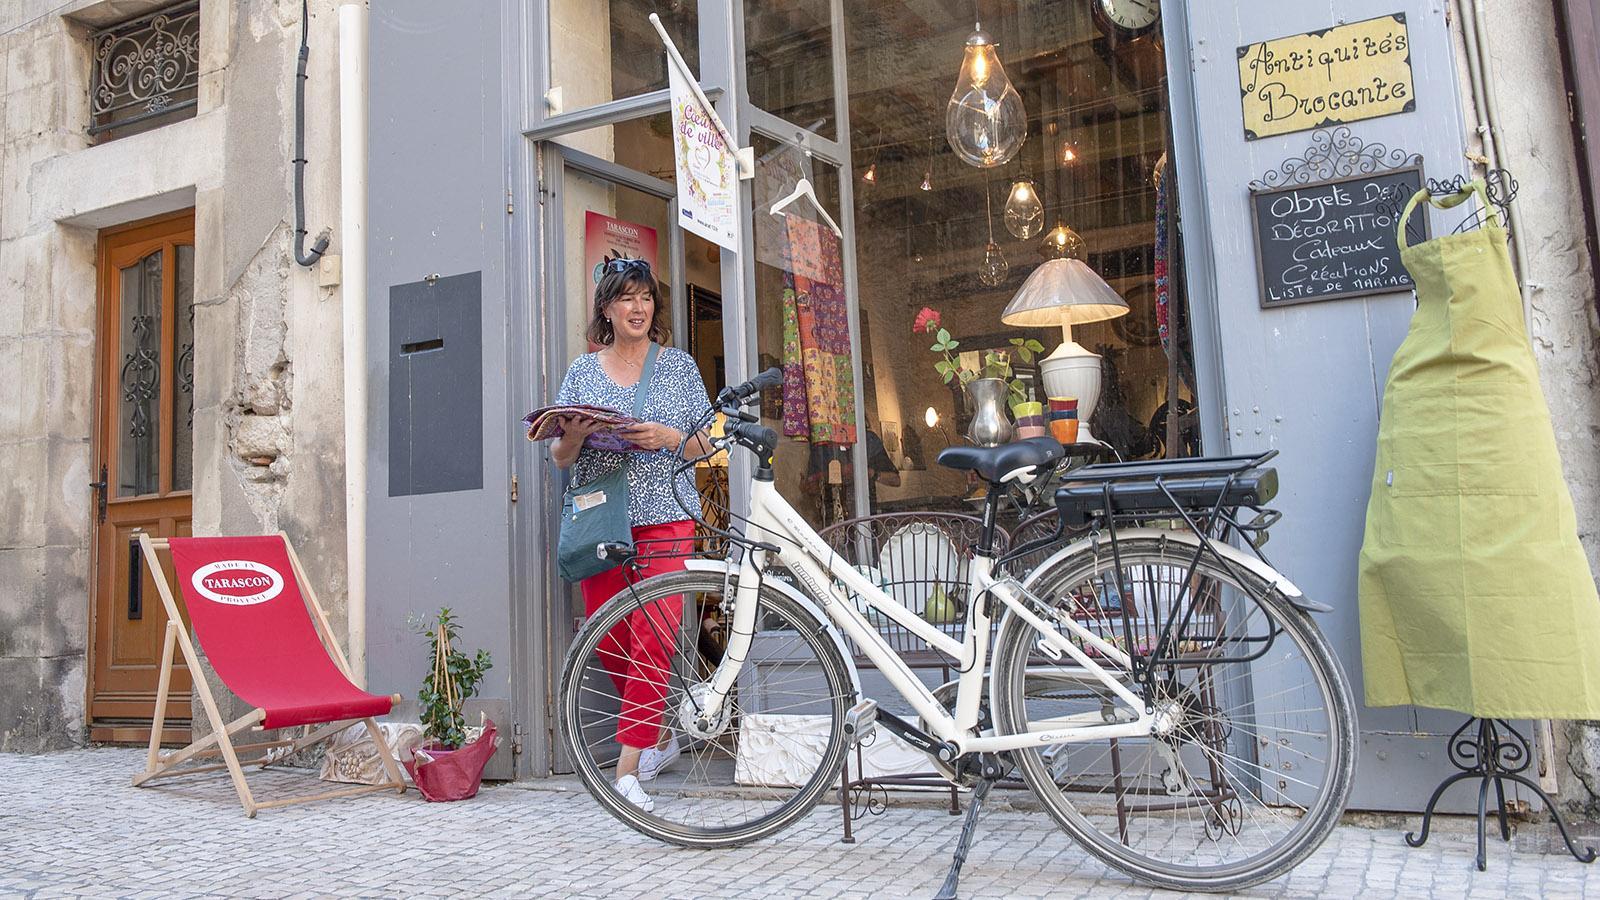 Boutique in Tarascon. Foto: Hilke Maunder